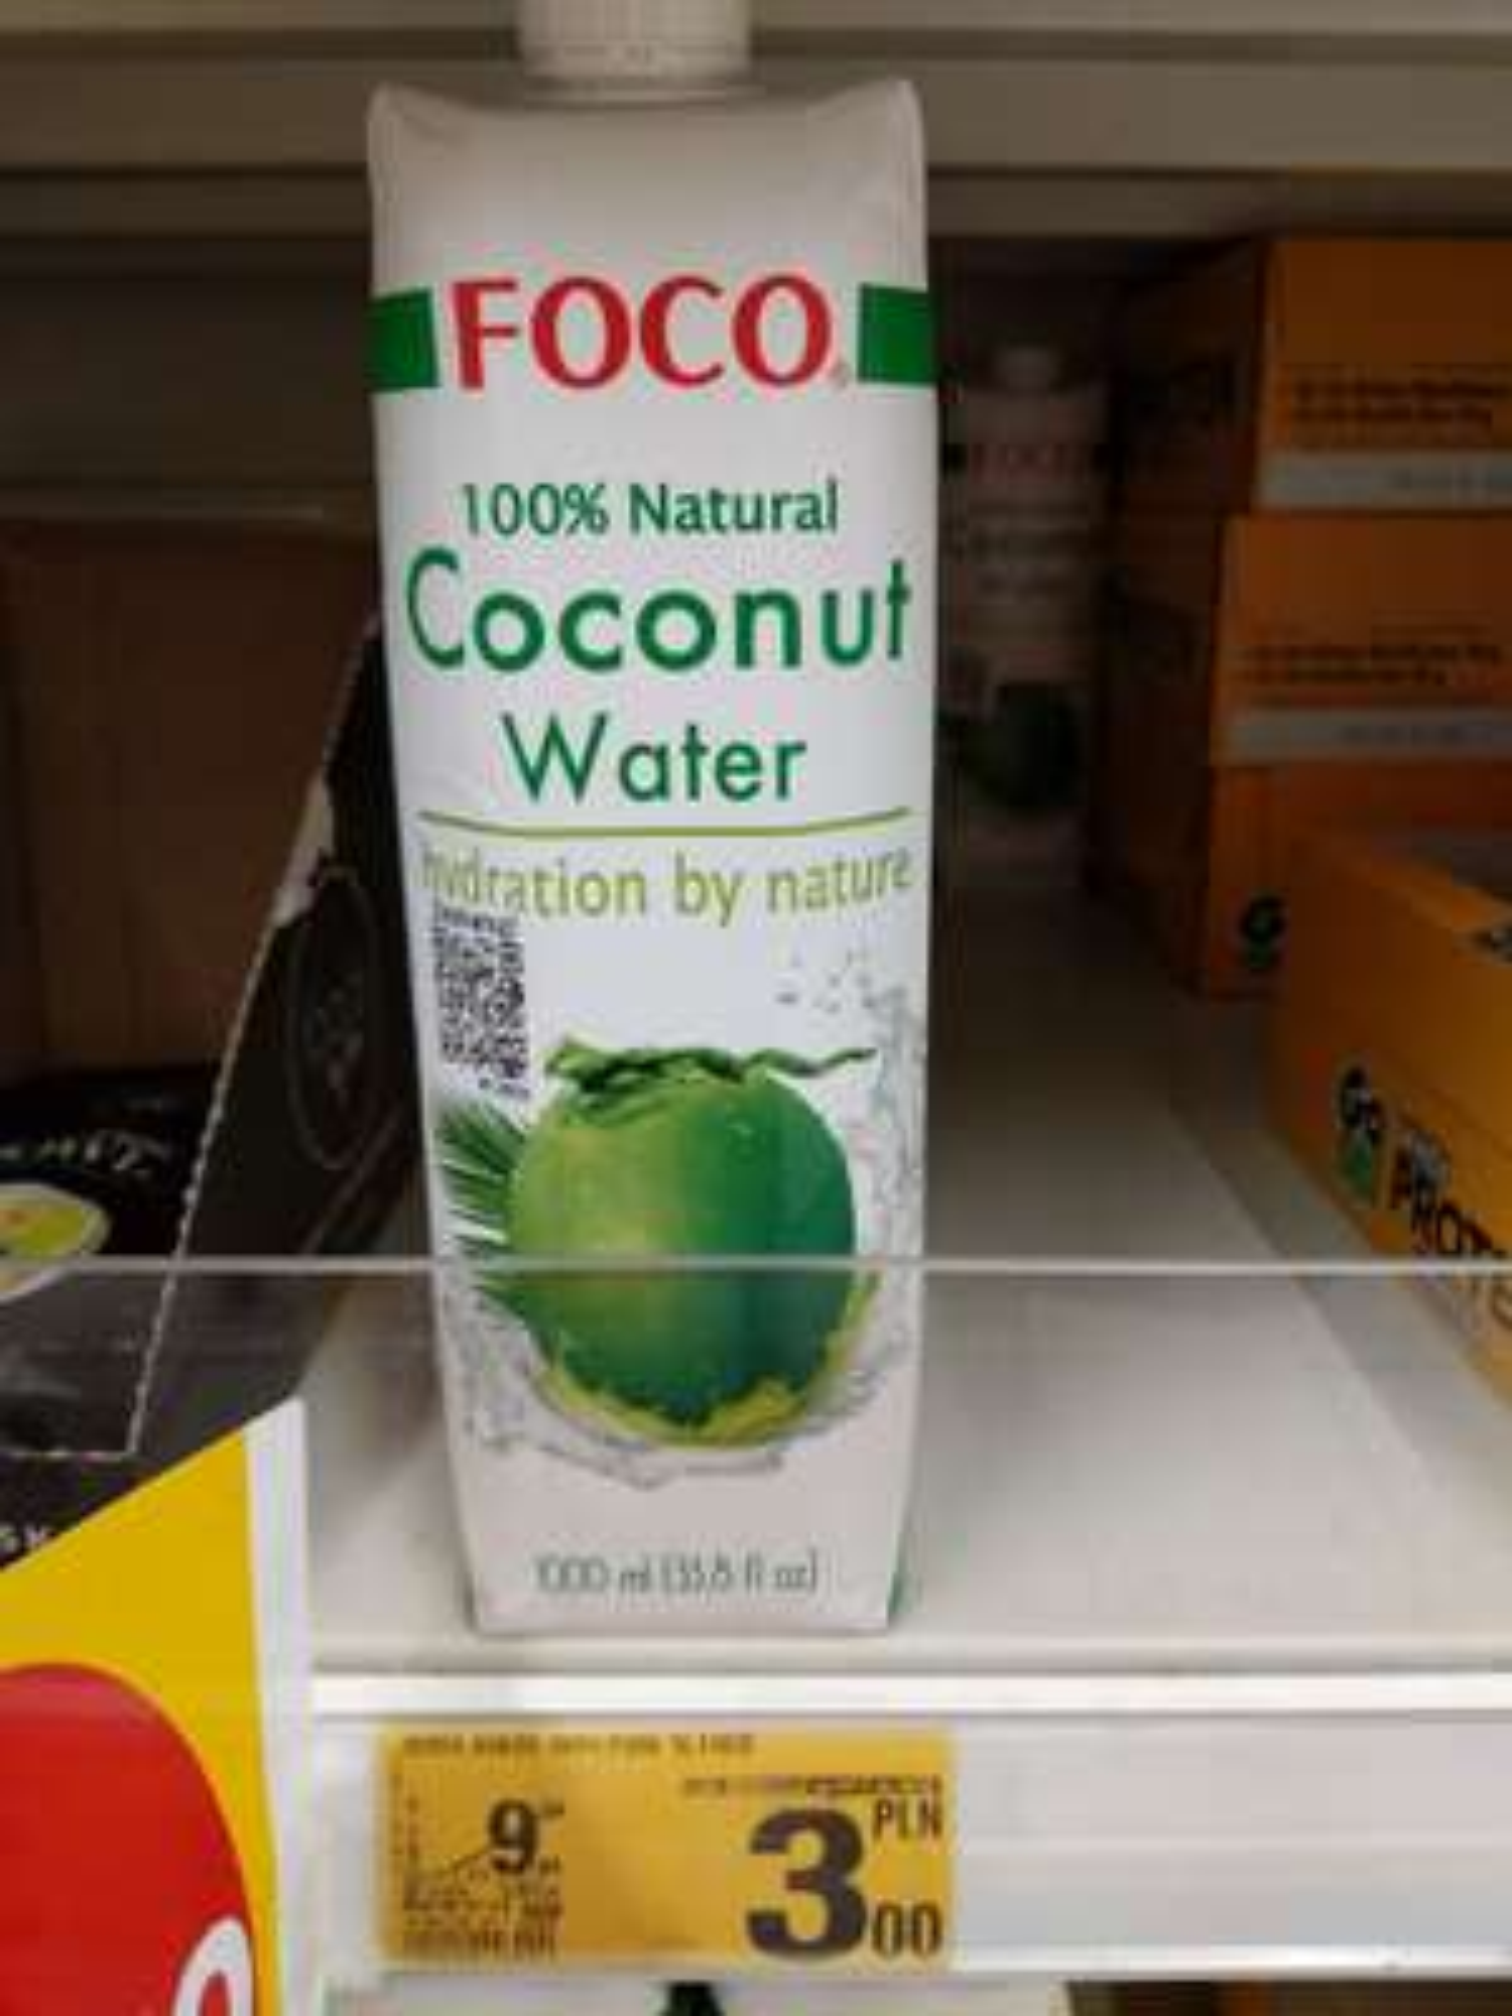 Woda kokosowa 100% natural Coconut Water FOCO 1LITR Auchan Sosnowiec